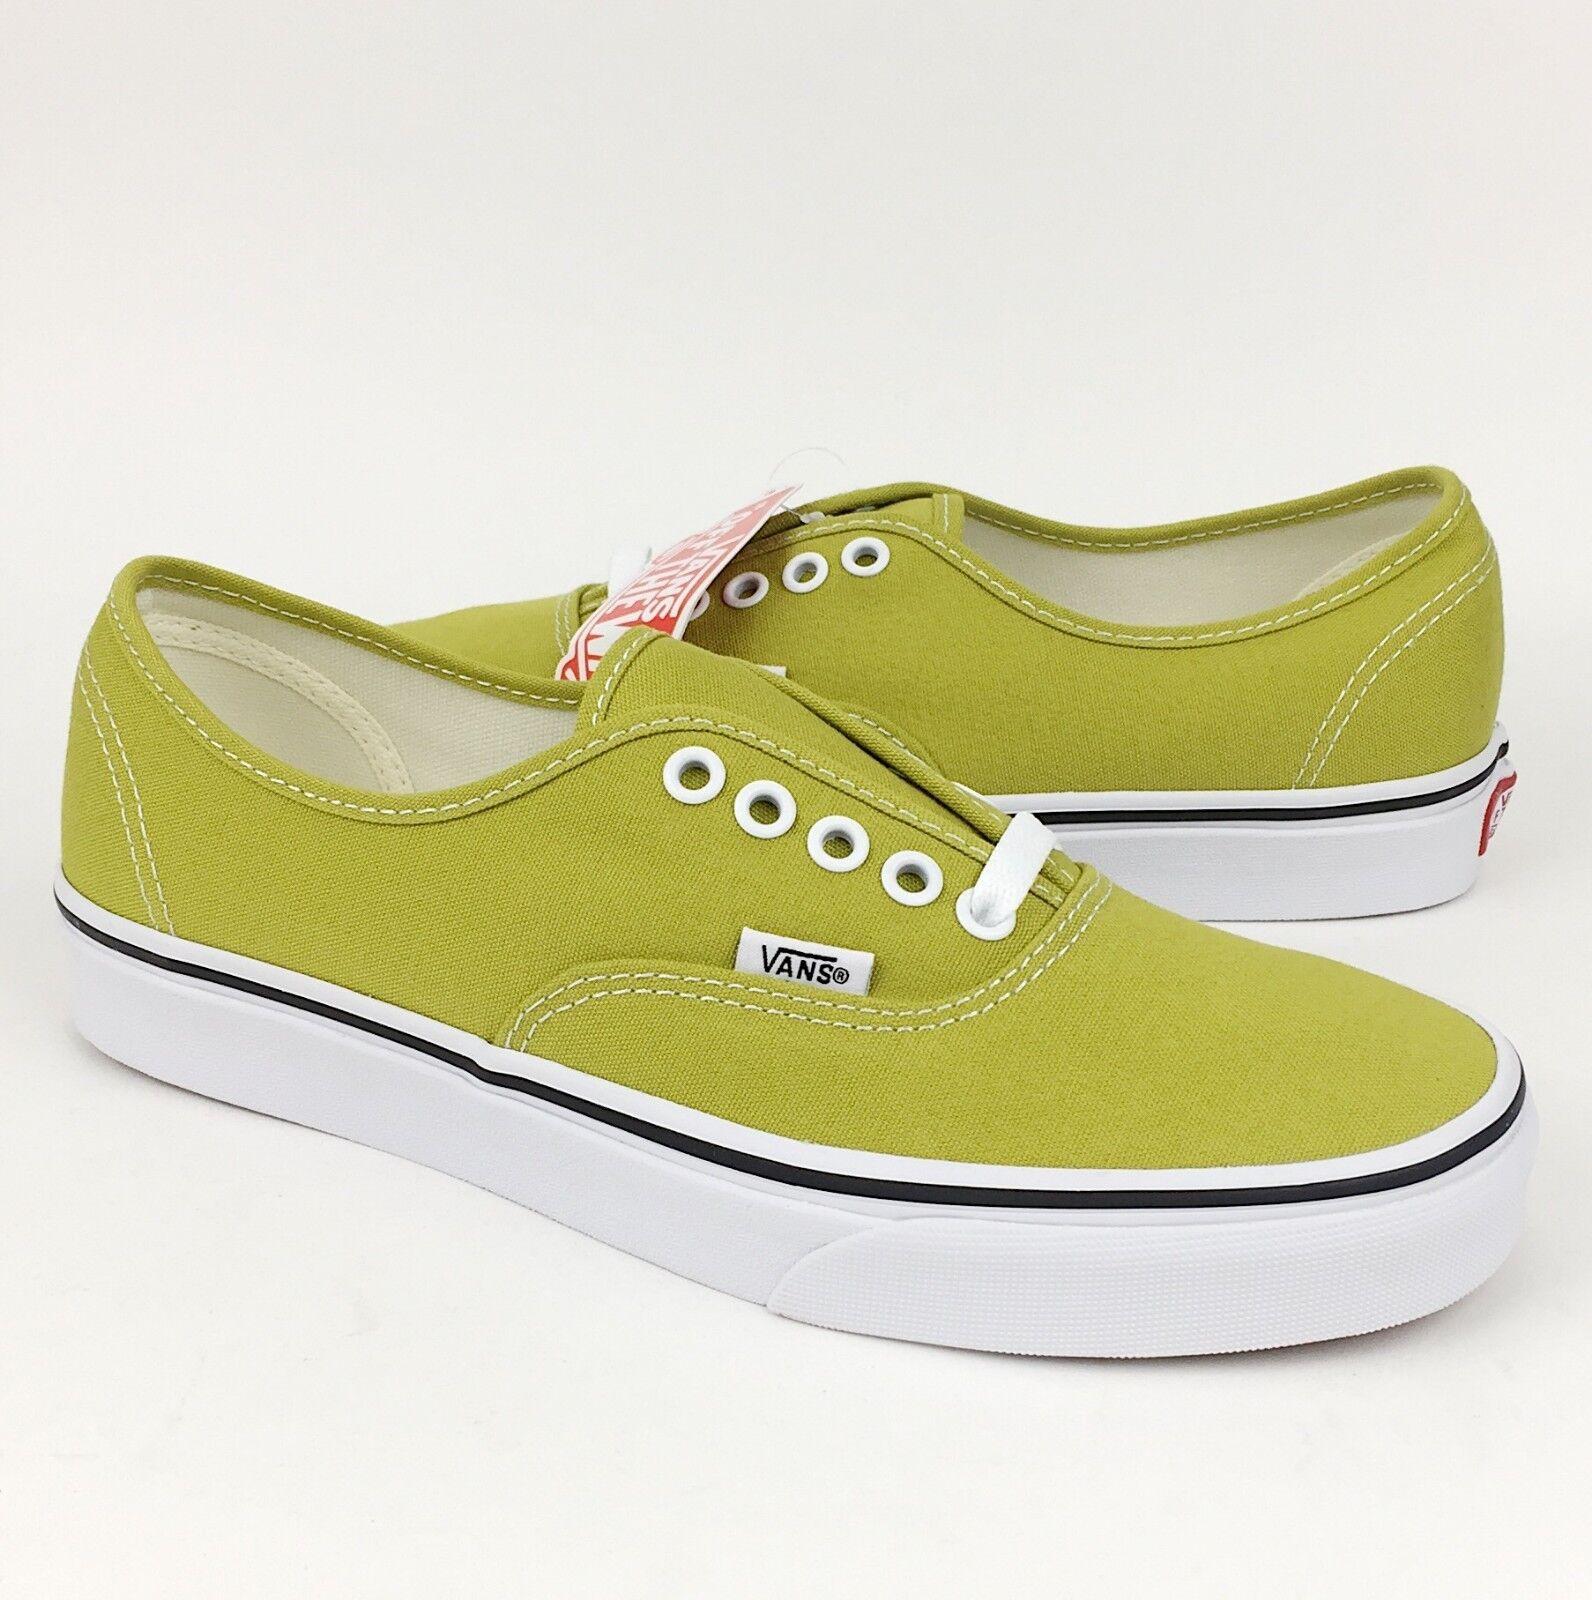 72c8d653e60a Vans New Vans Authentic Canvas Skate Shoe Cress Green True White  Skateboarding